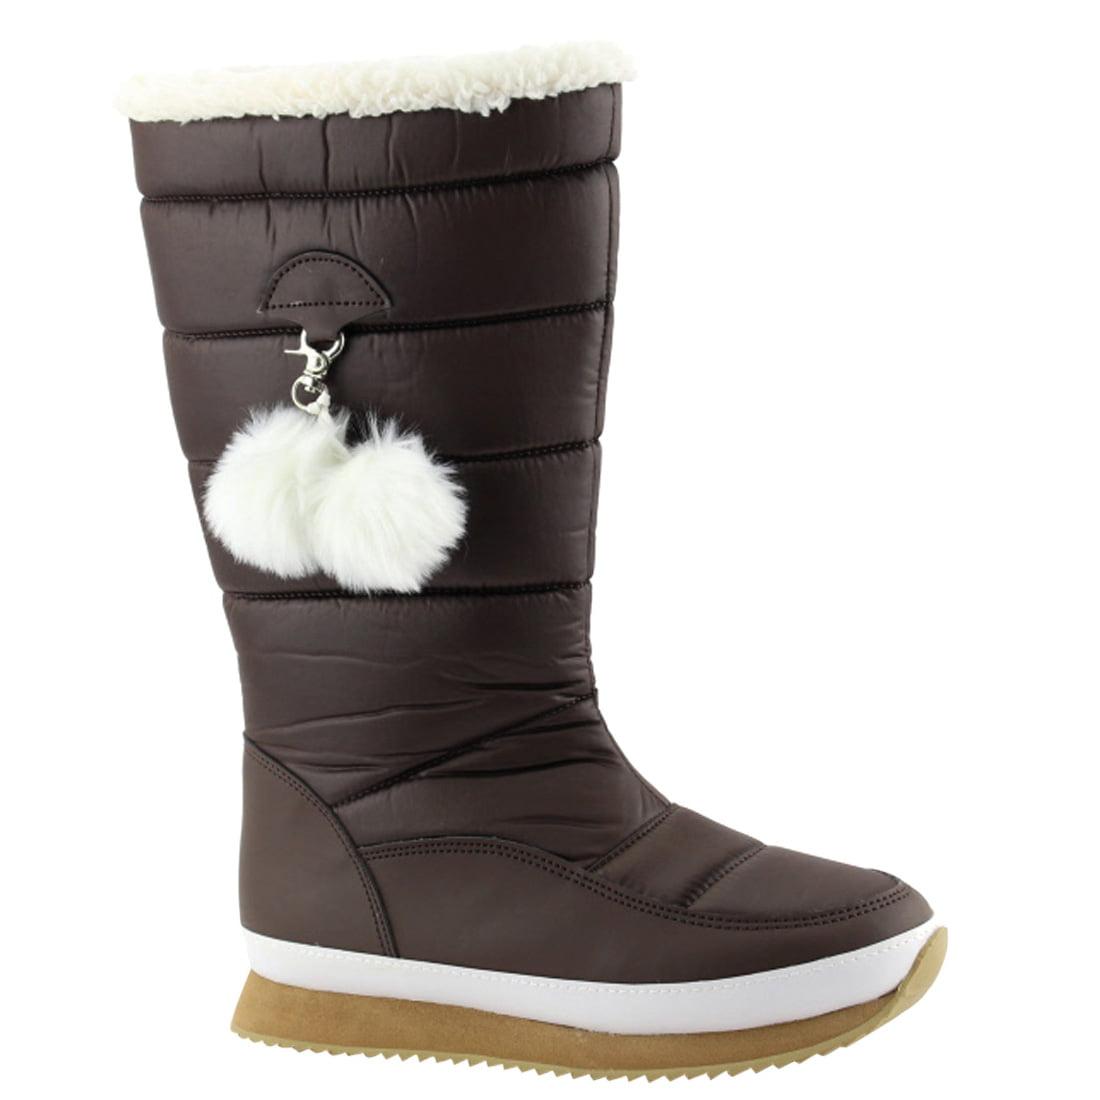 NATURE BREEZE EK88 Women's Pompom Tick Sole Mid Calf Cold Weather Snow Boots by